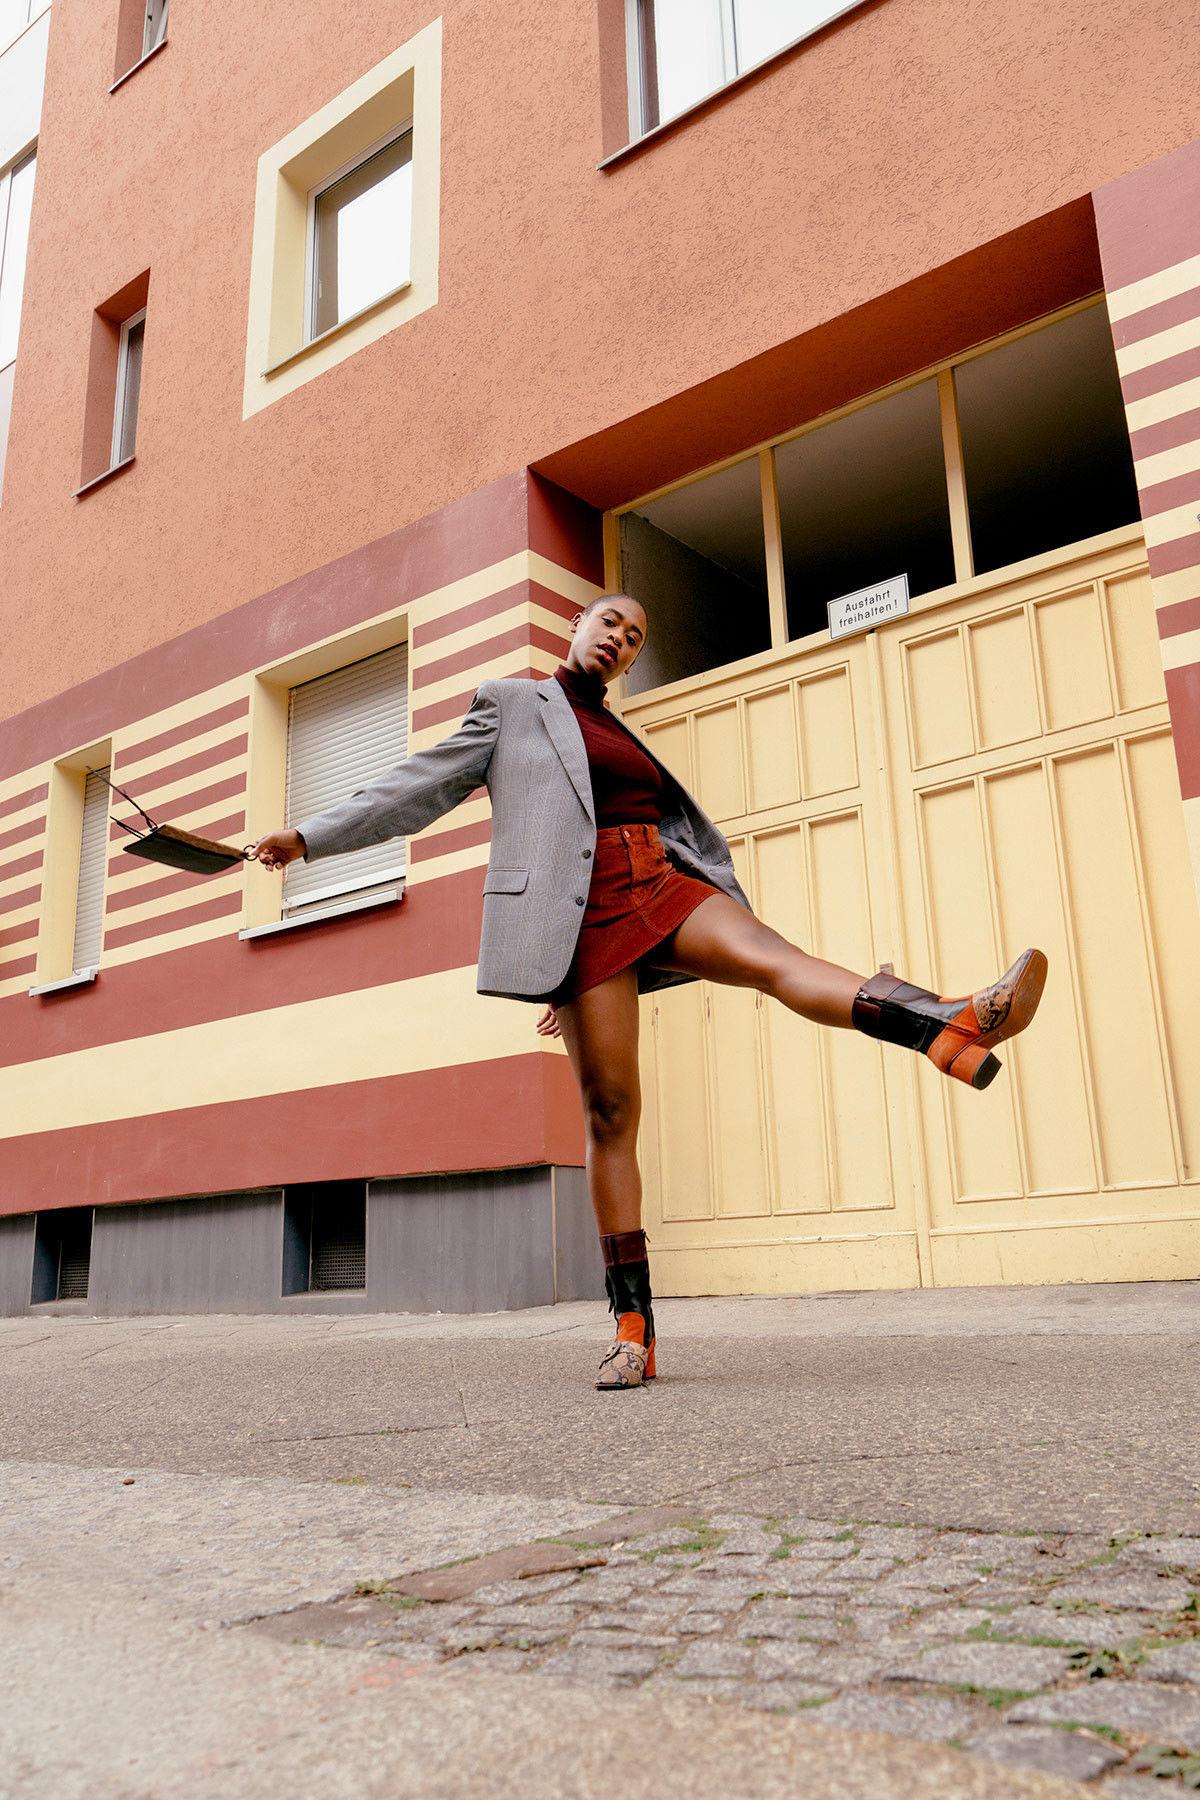 Rita Lino c/o TAKE Agency for Highsnobiety x Coach